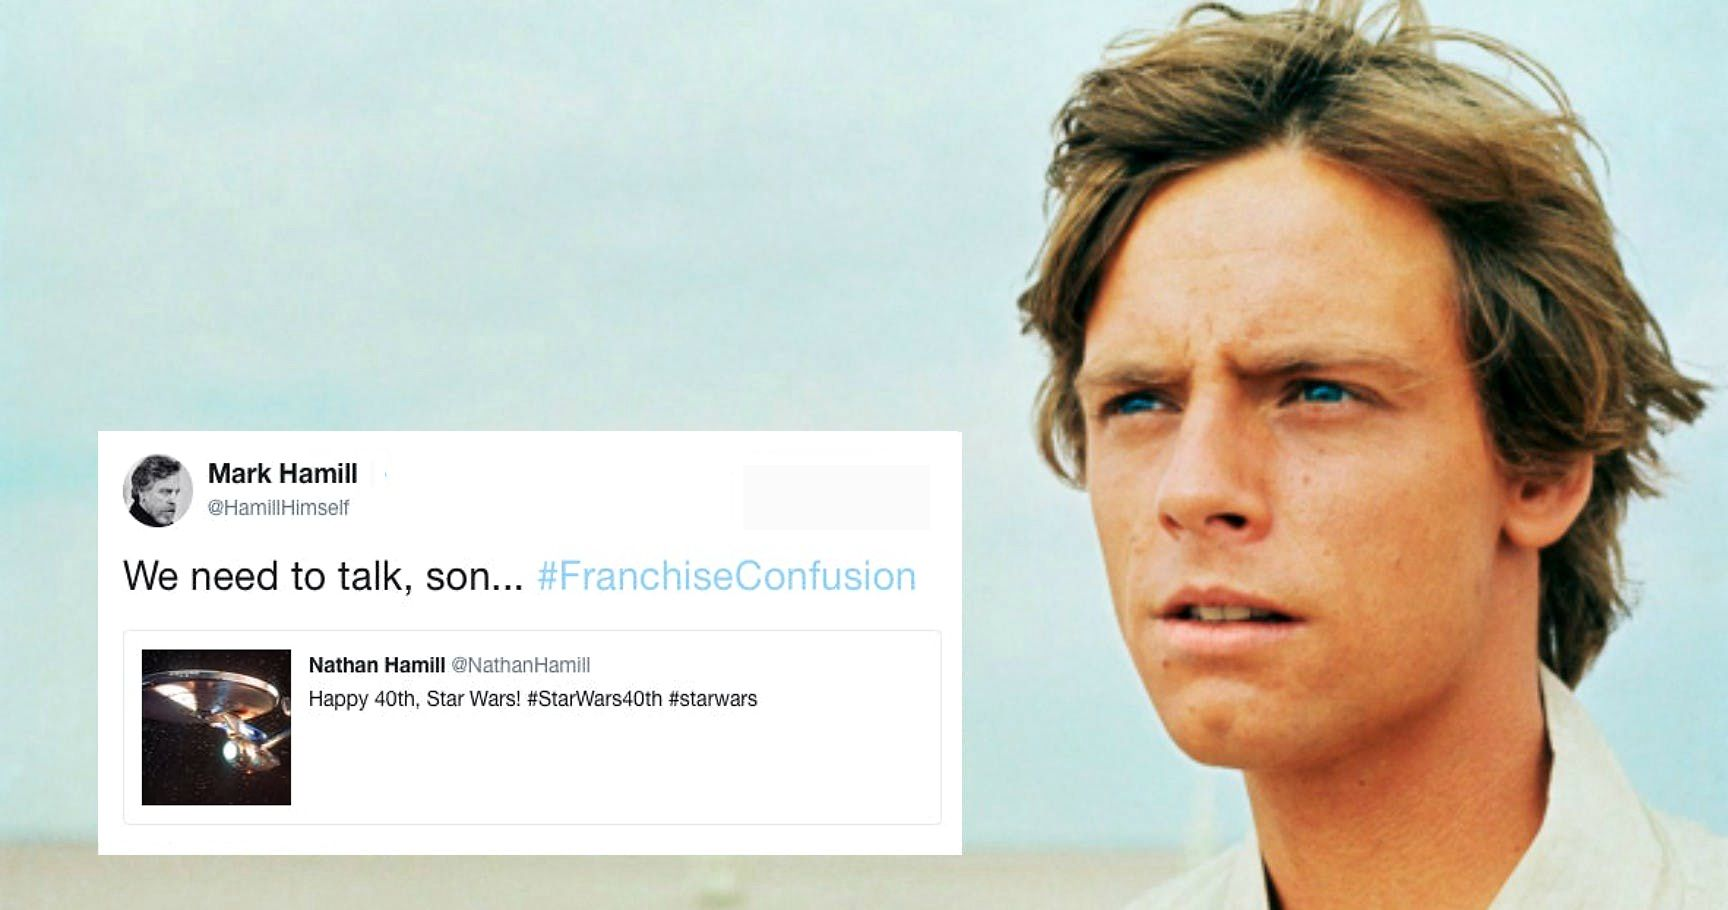 15 Hilariously Vicious Star Trek Vs. Star Wars Tweets That Will Make You ROFL